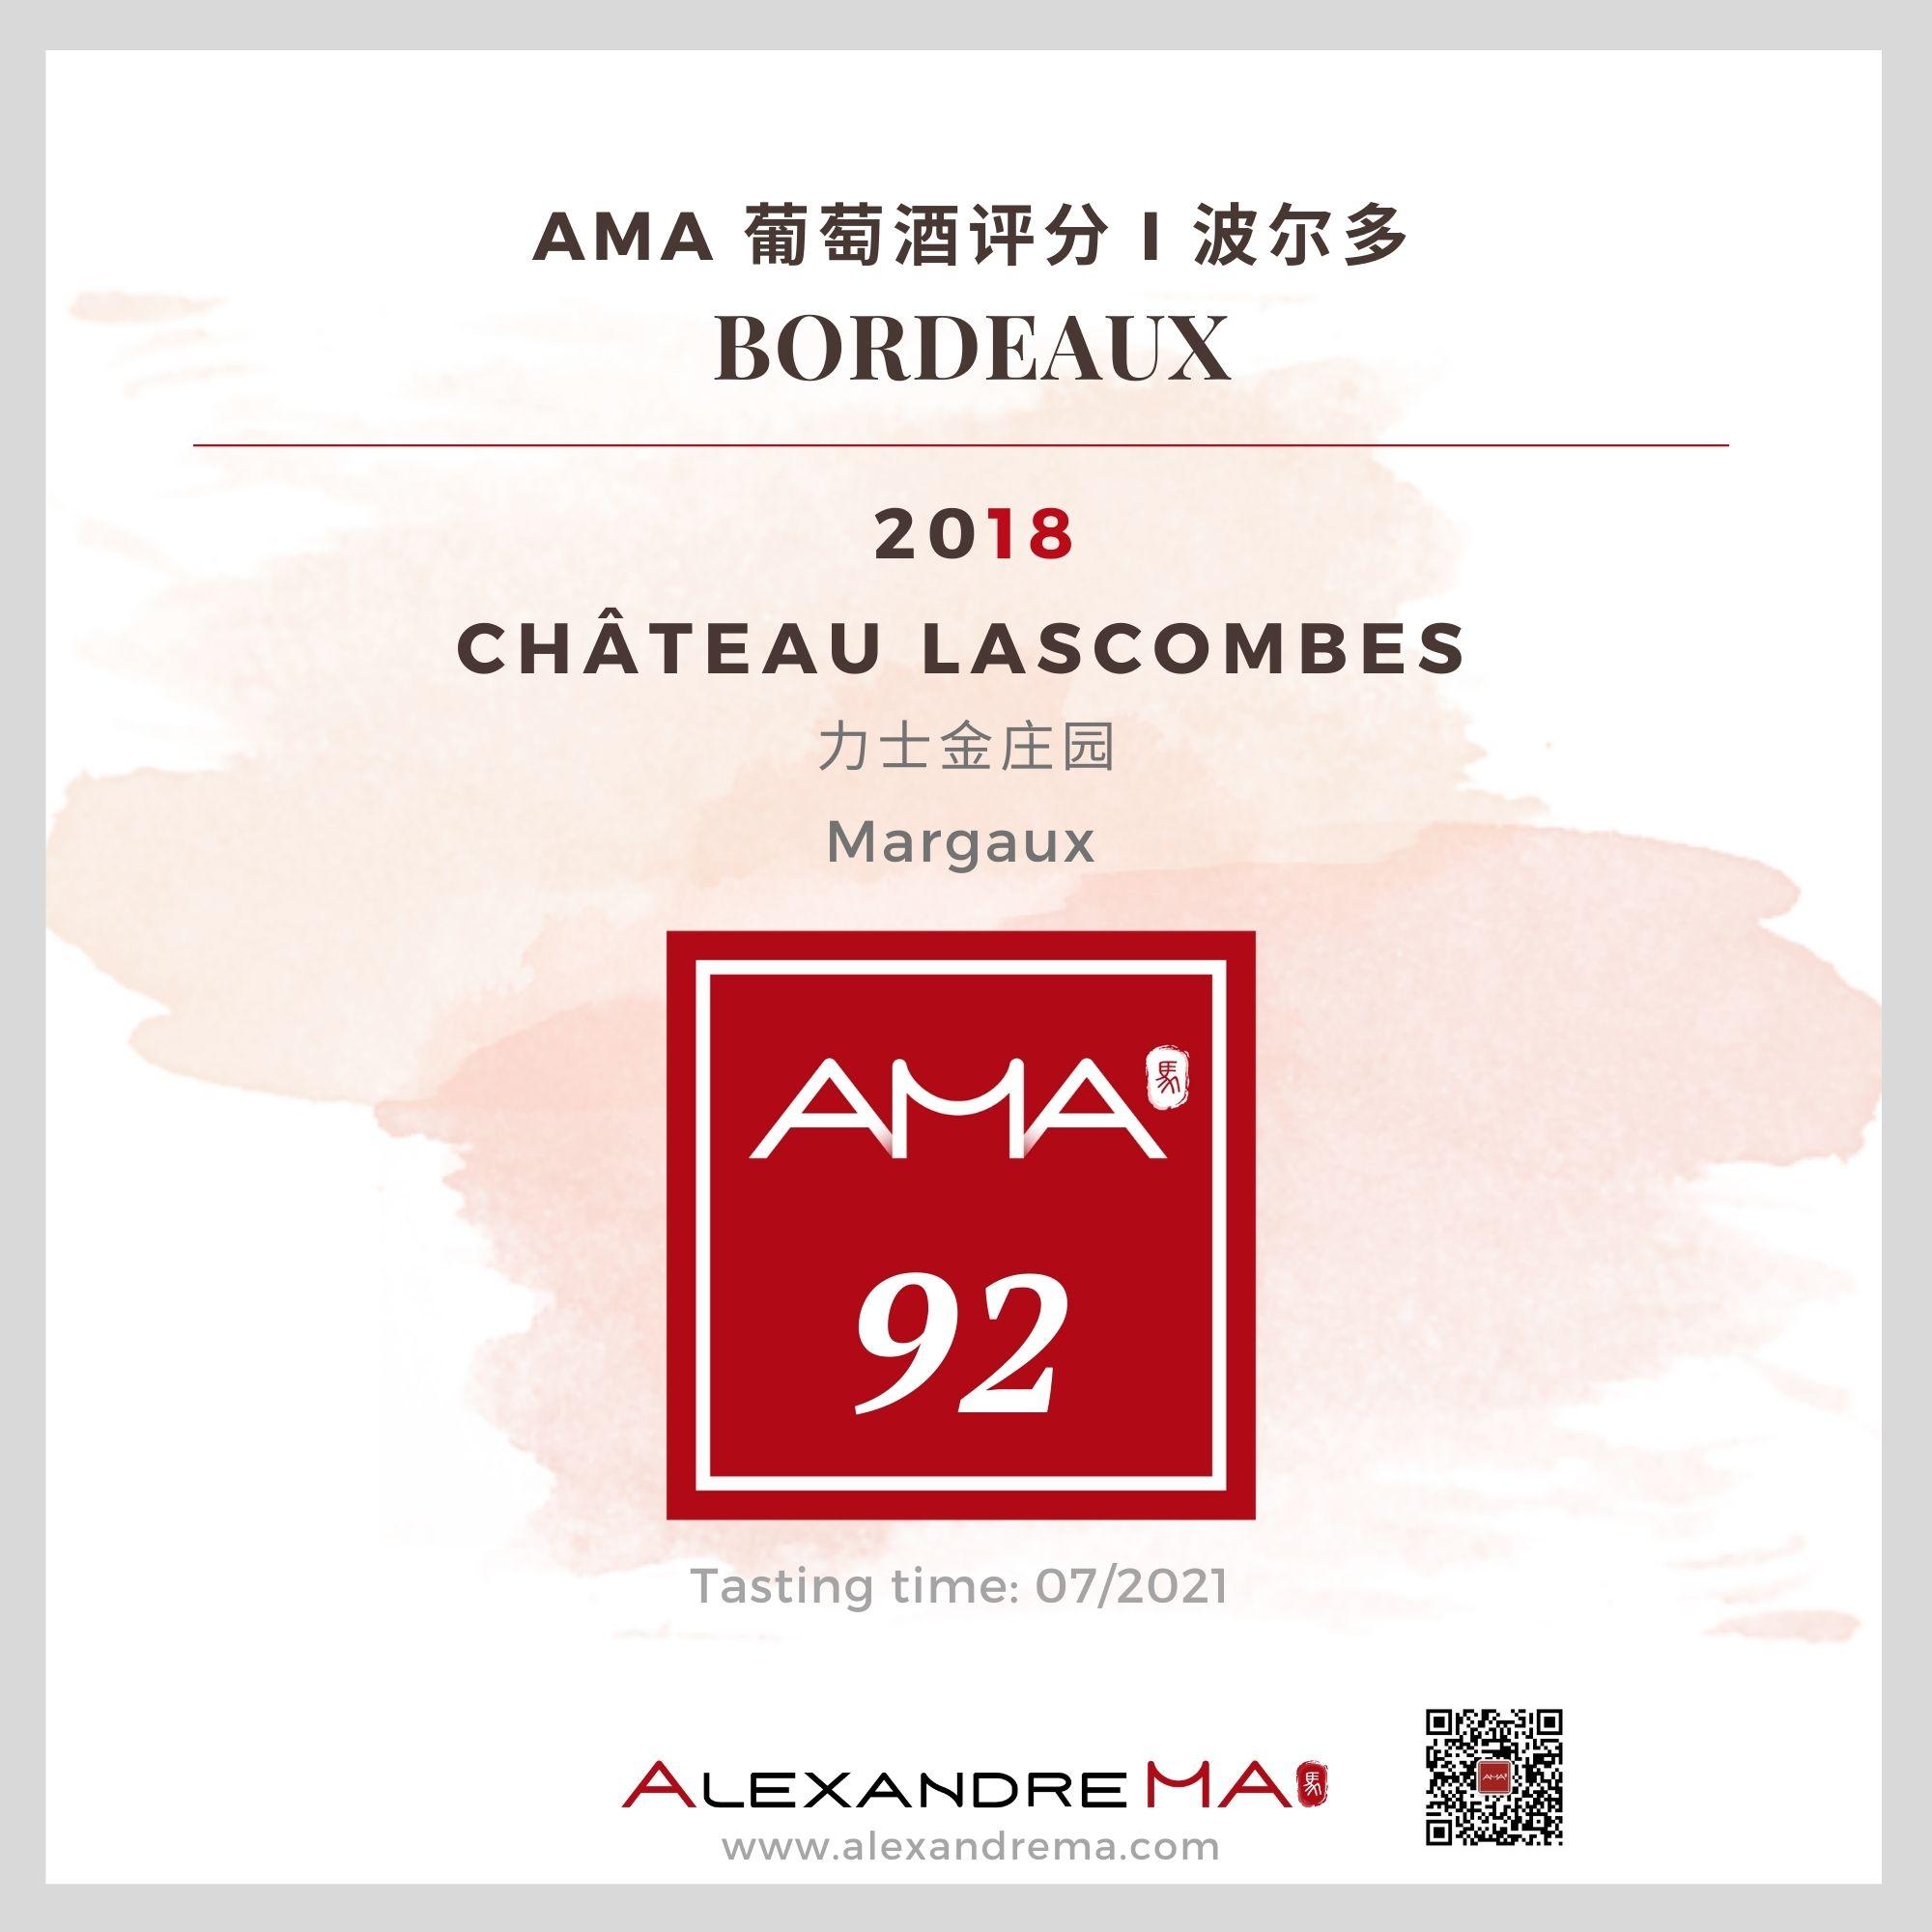 Château Lascombes 2018 力士金庄园 - Alexandre Ma